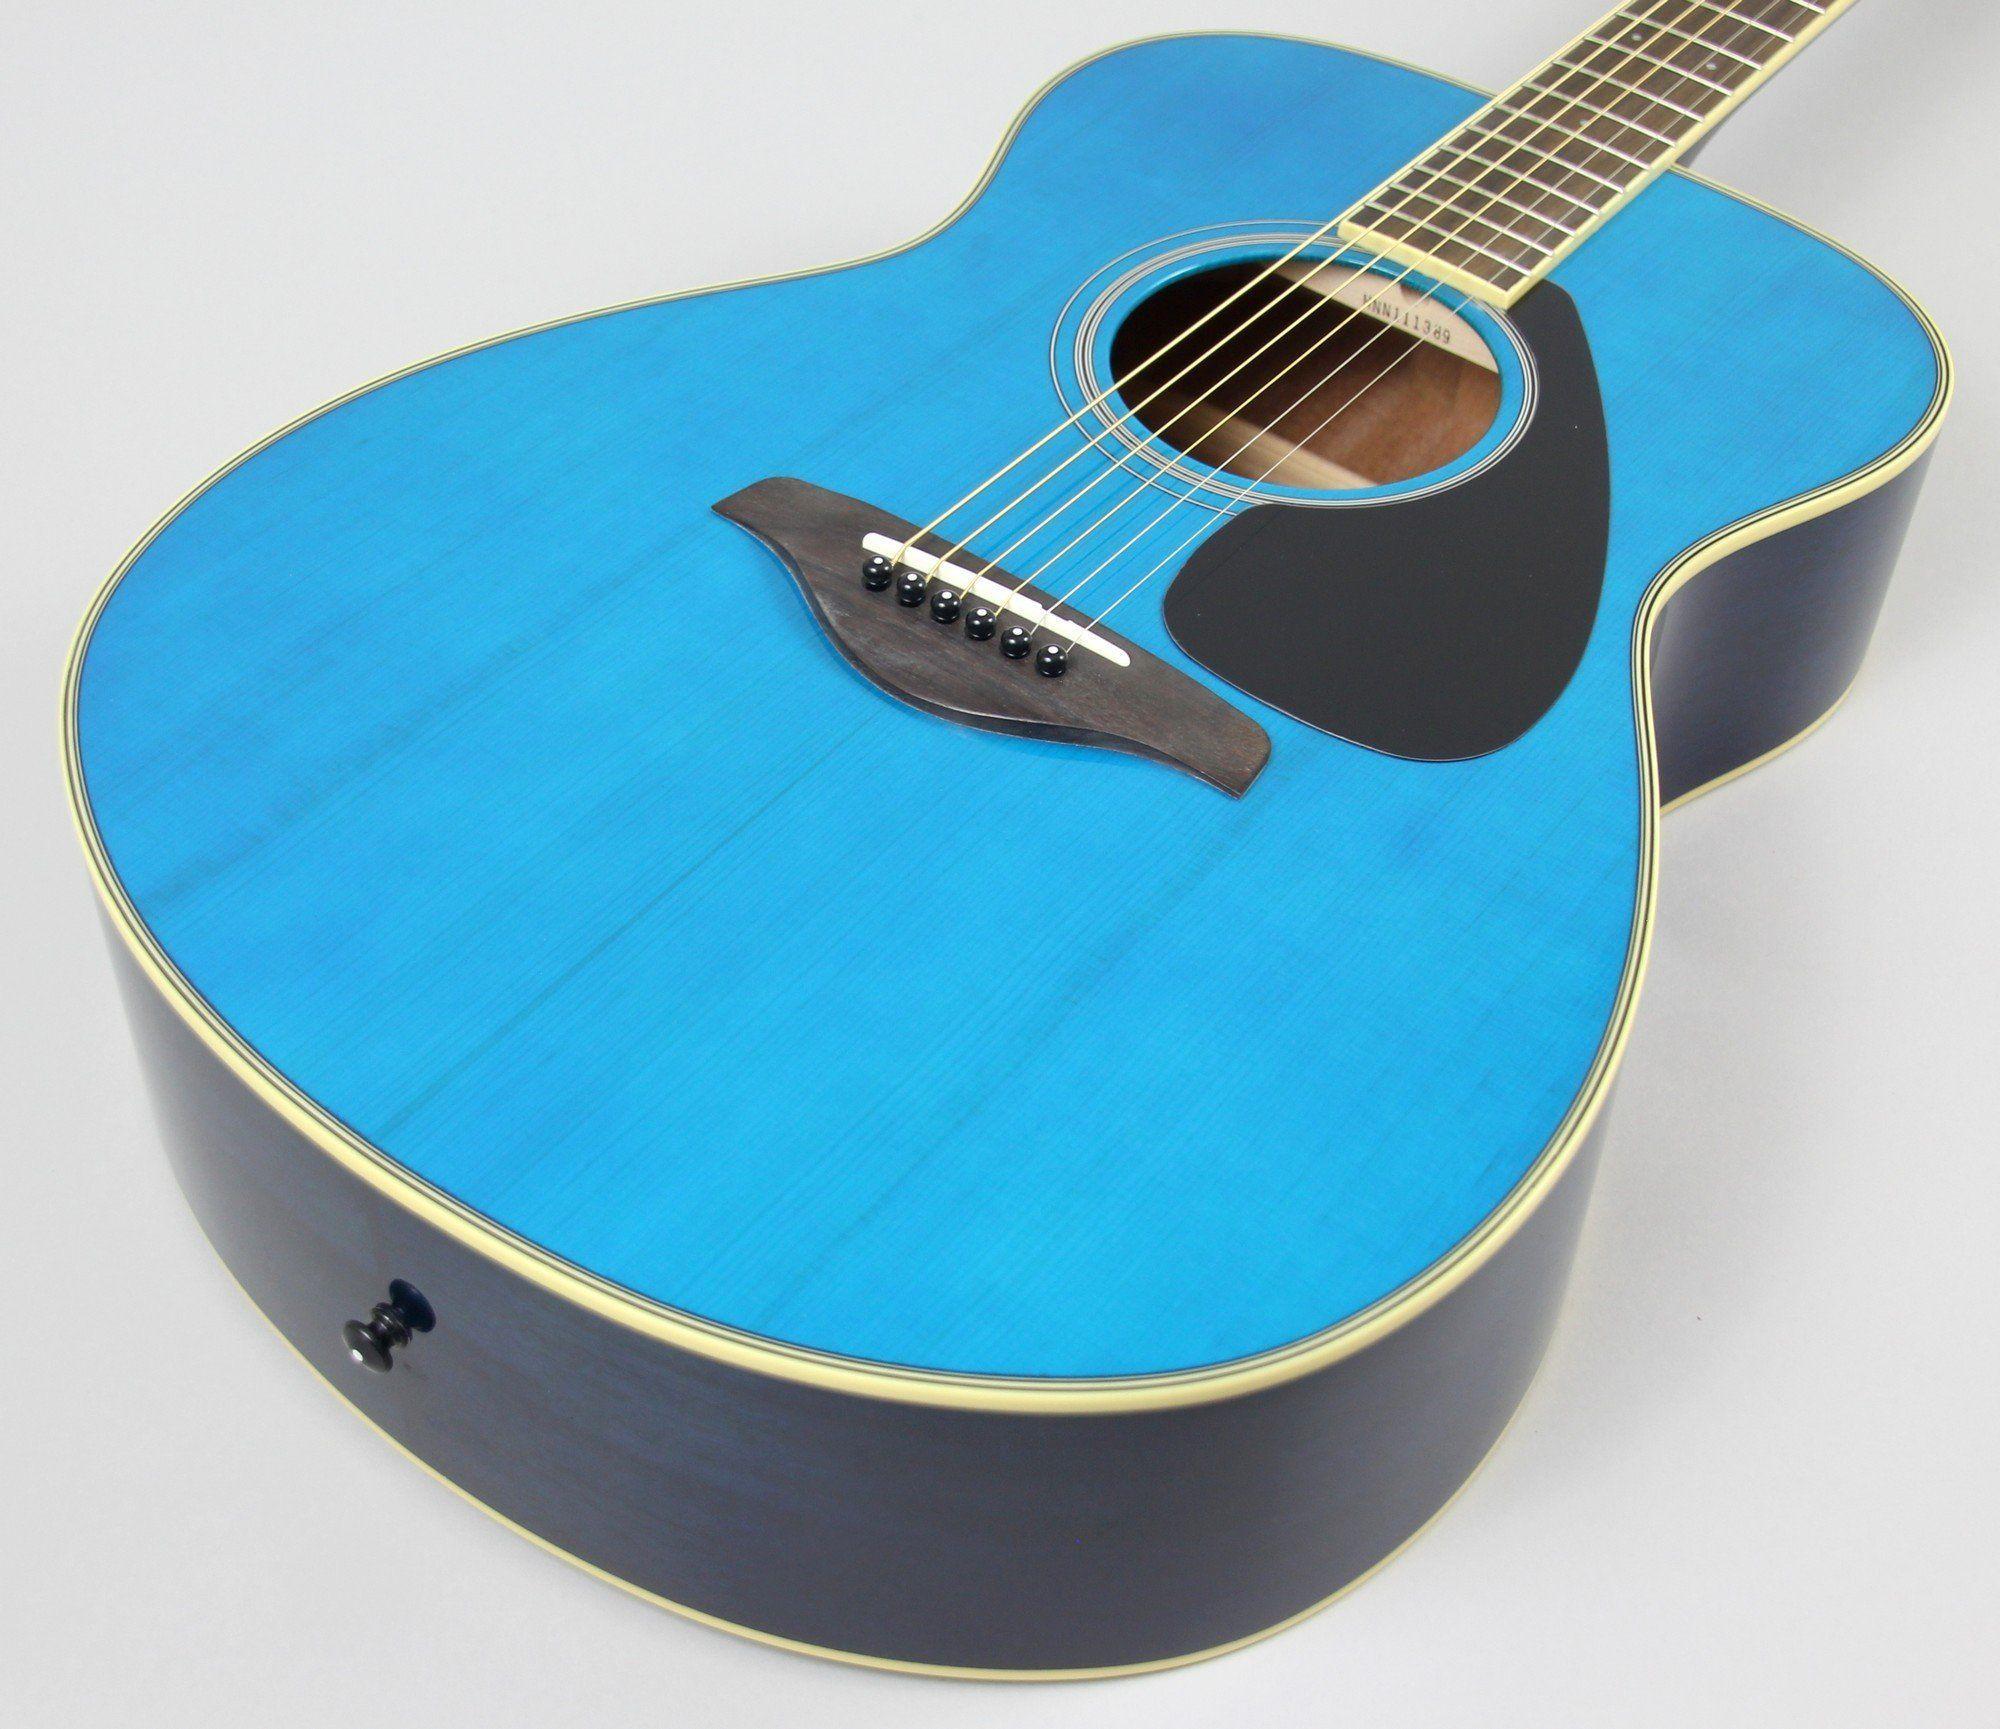 Yamaha Fs820tq Acoustic Guitar Turqoise Yamaha Guitar Guitar Yamaha Acoustic